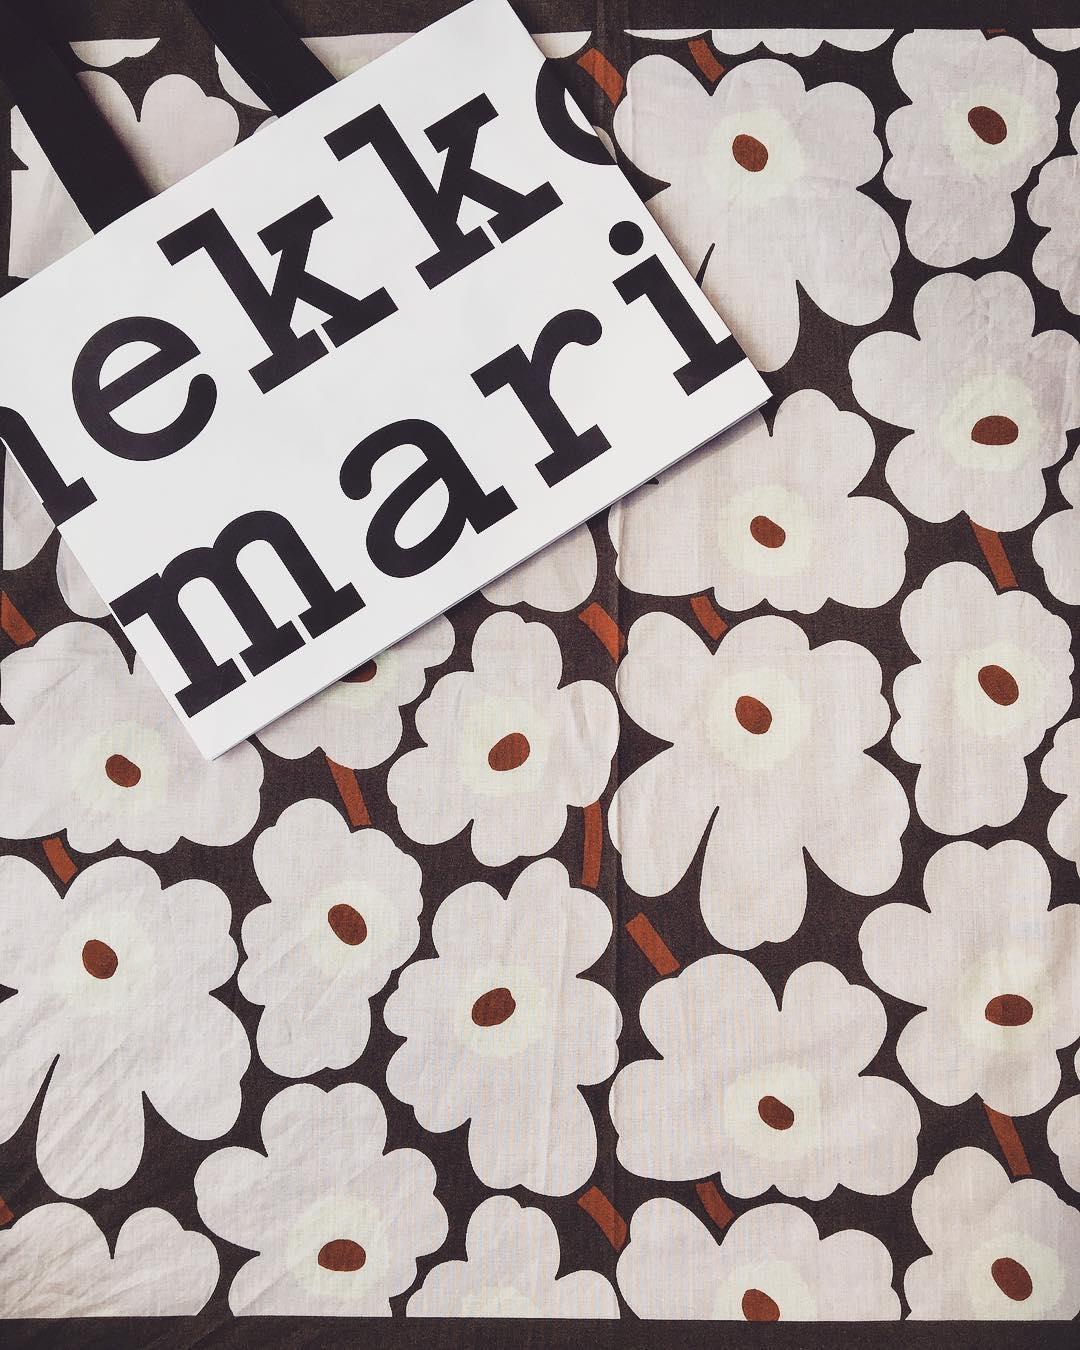 marimekkoの可愛い雑貨たち